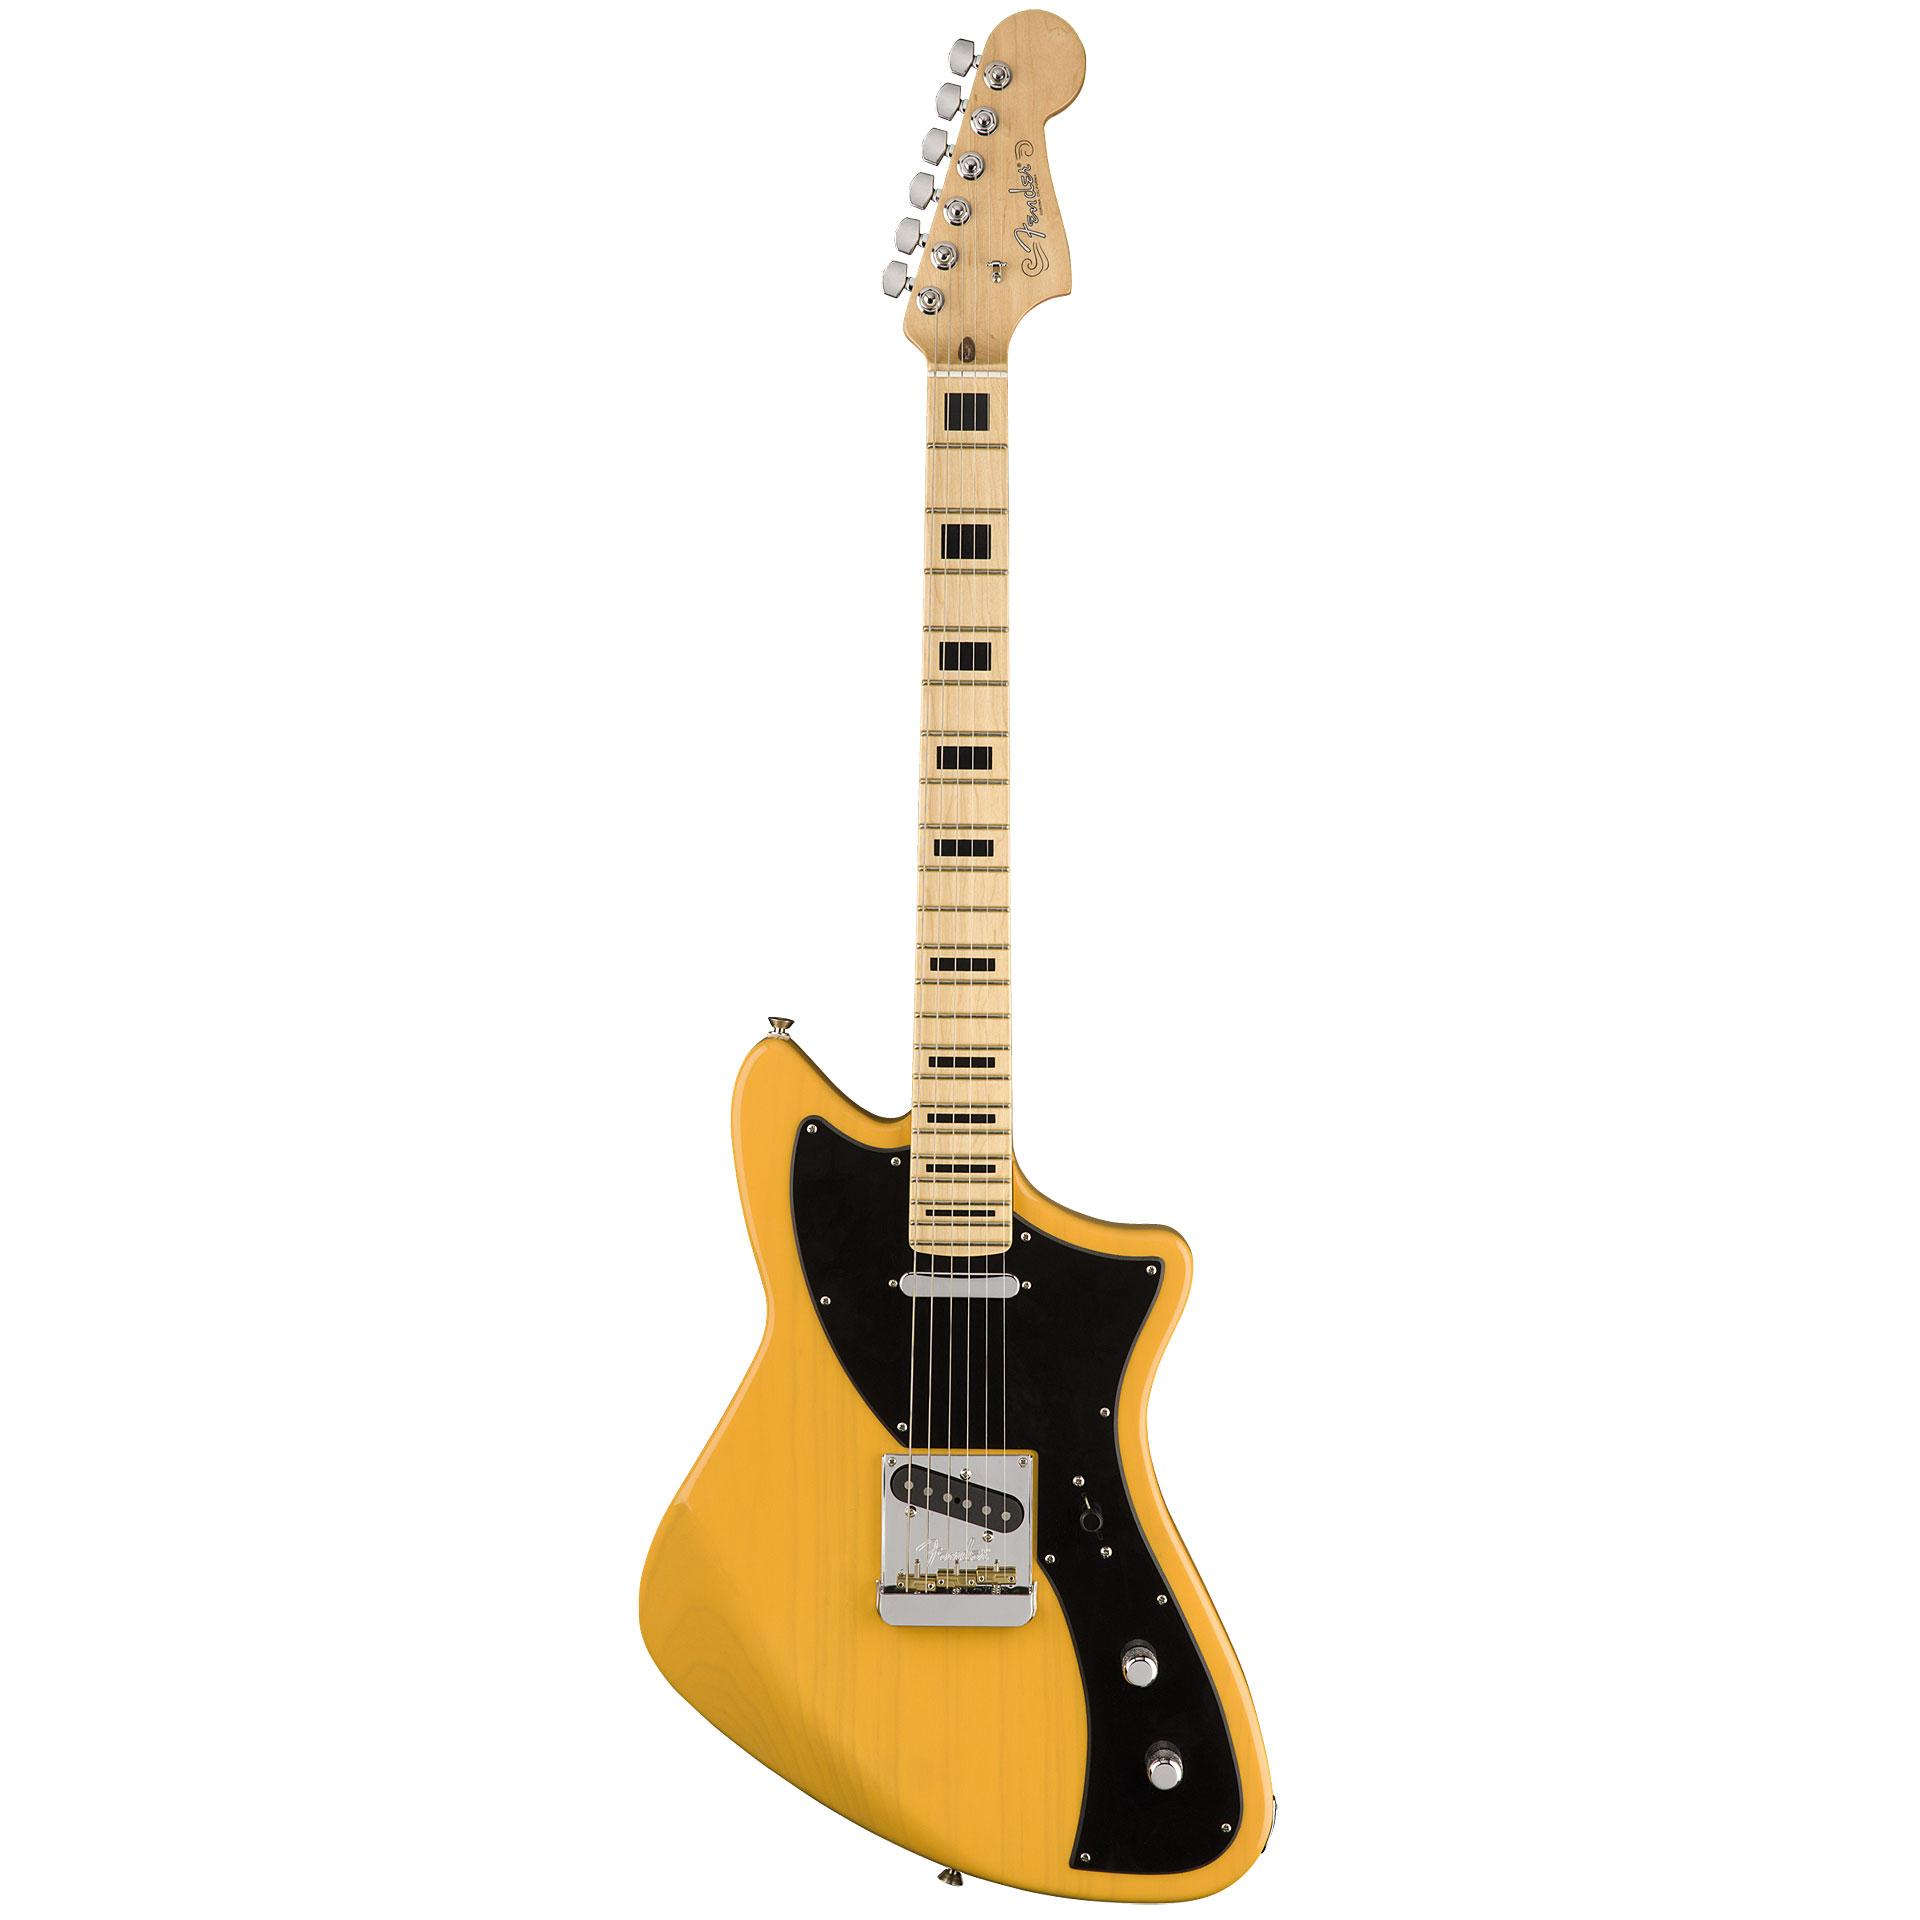 fender parallel universe meteora mn btb electric guitar. Black Bedroom Furniture Sets. Home Design Ideas